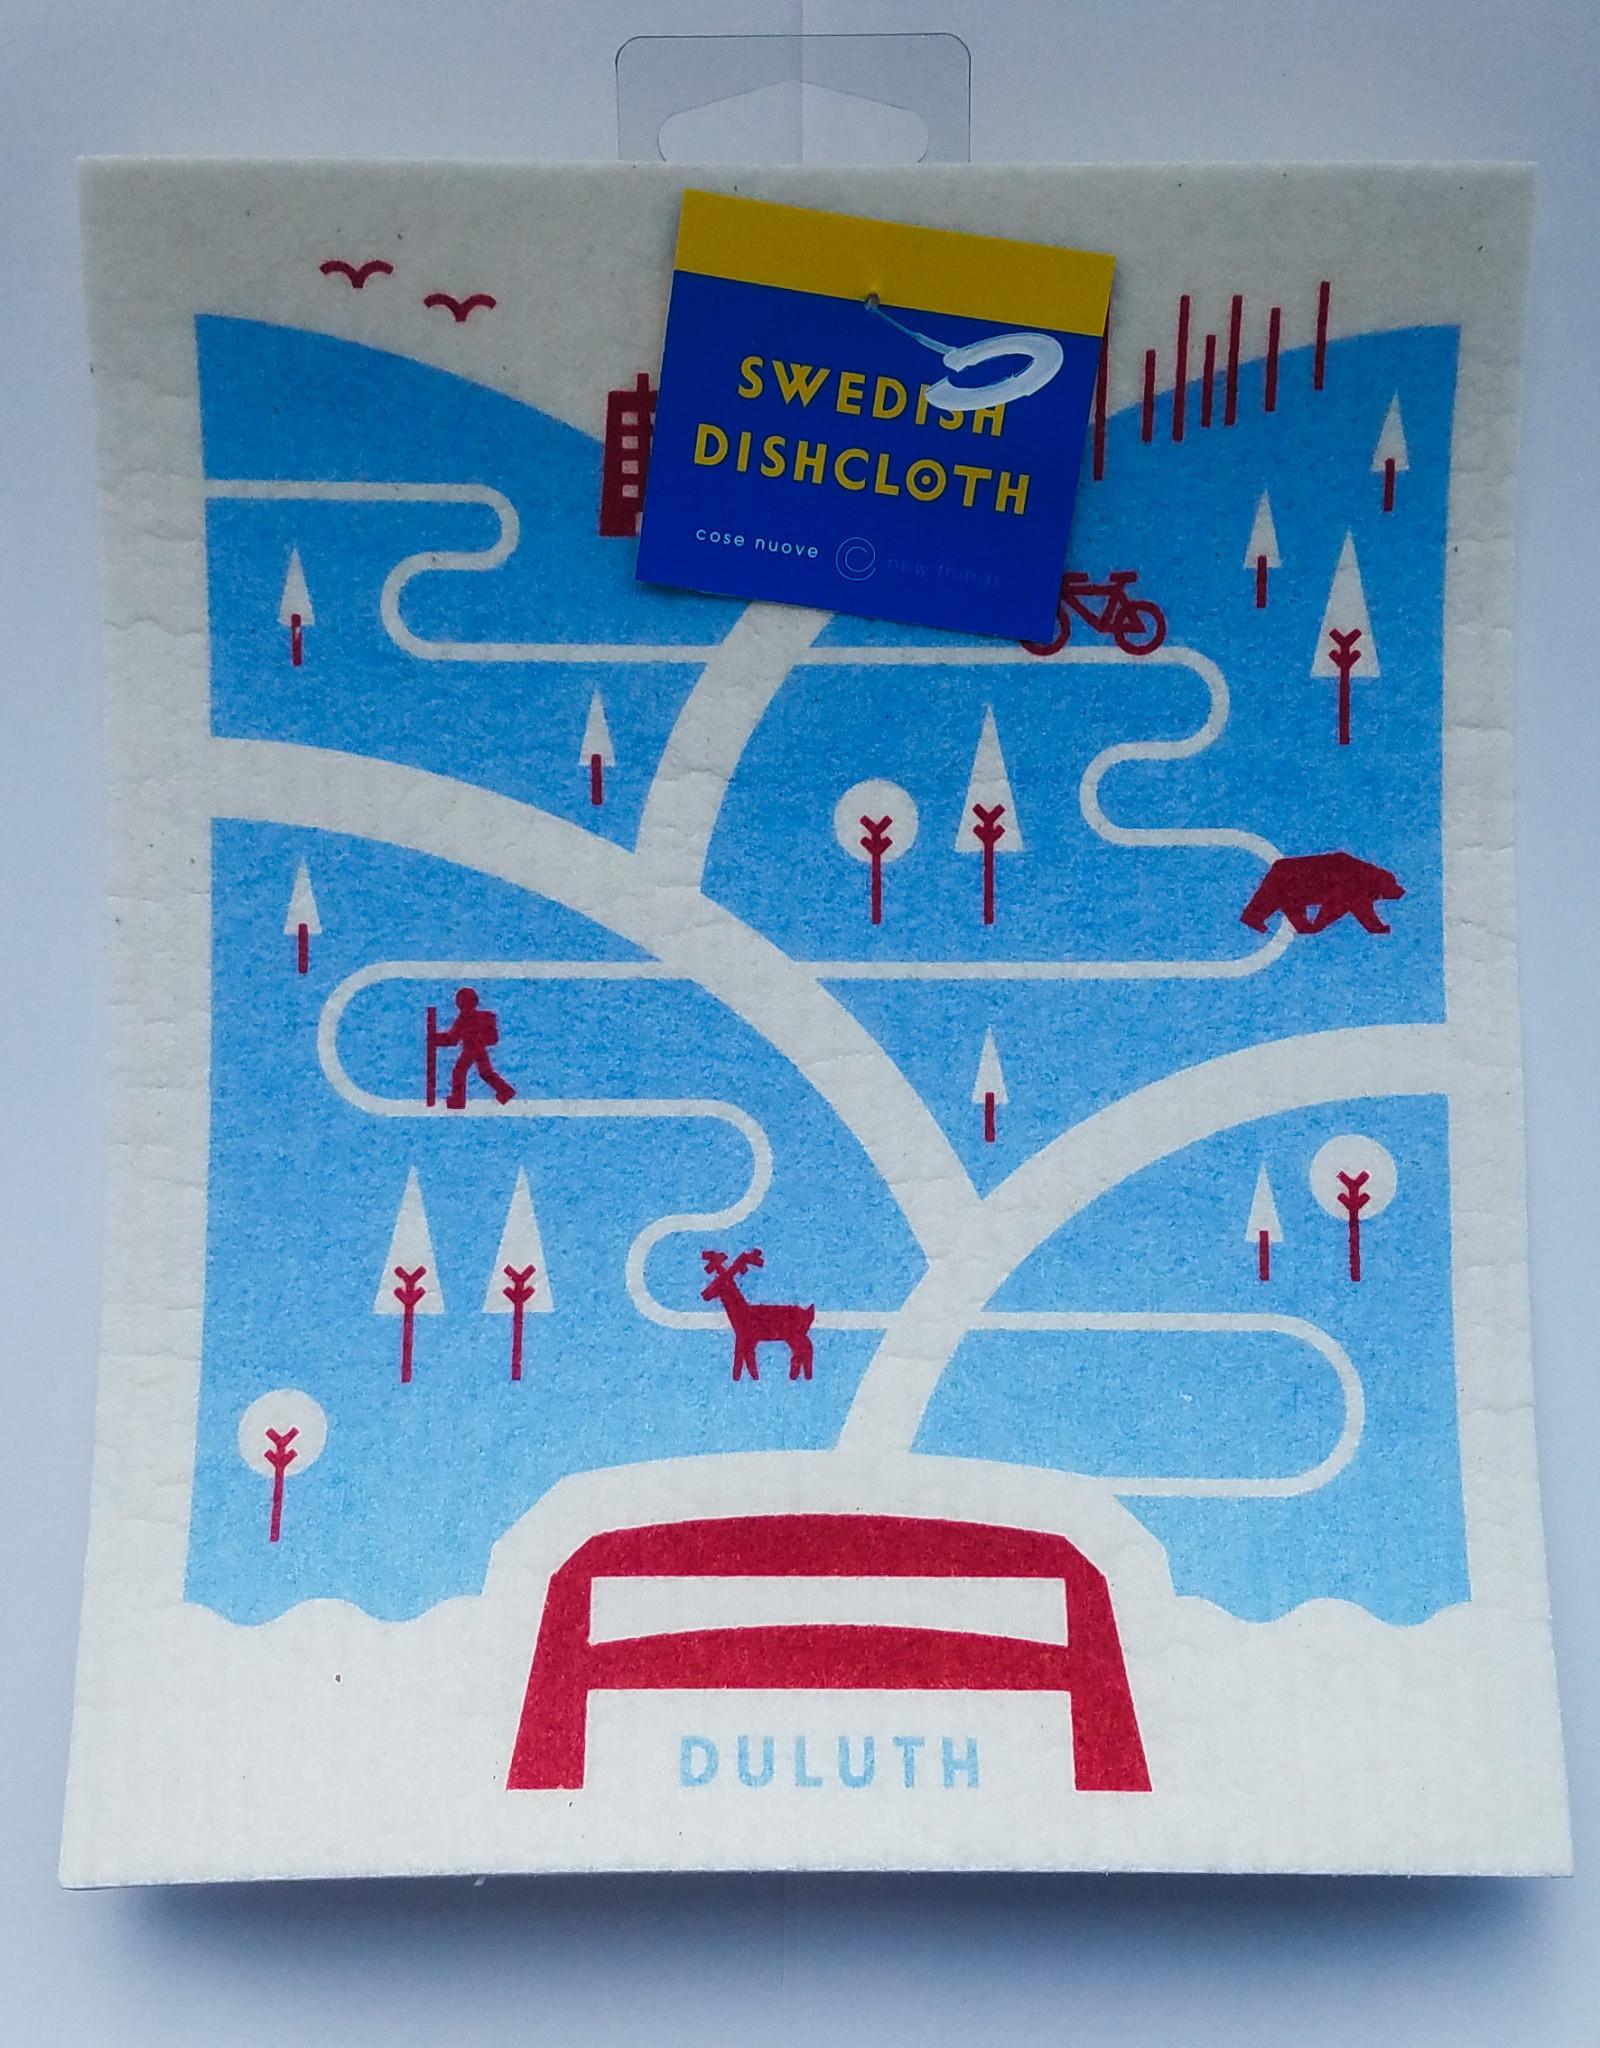 Cose Nuove Swedish Dishcloth, DULUTH